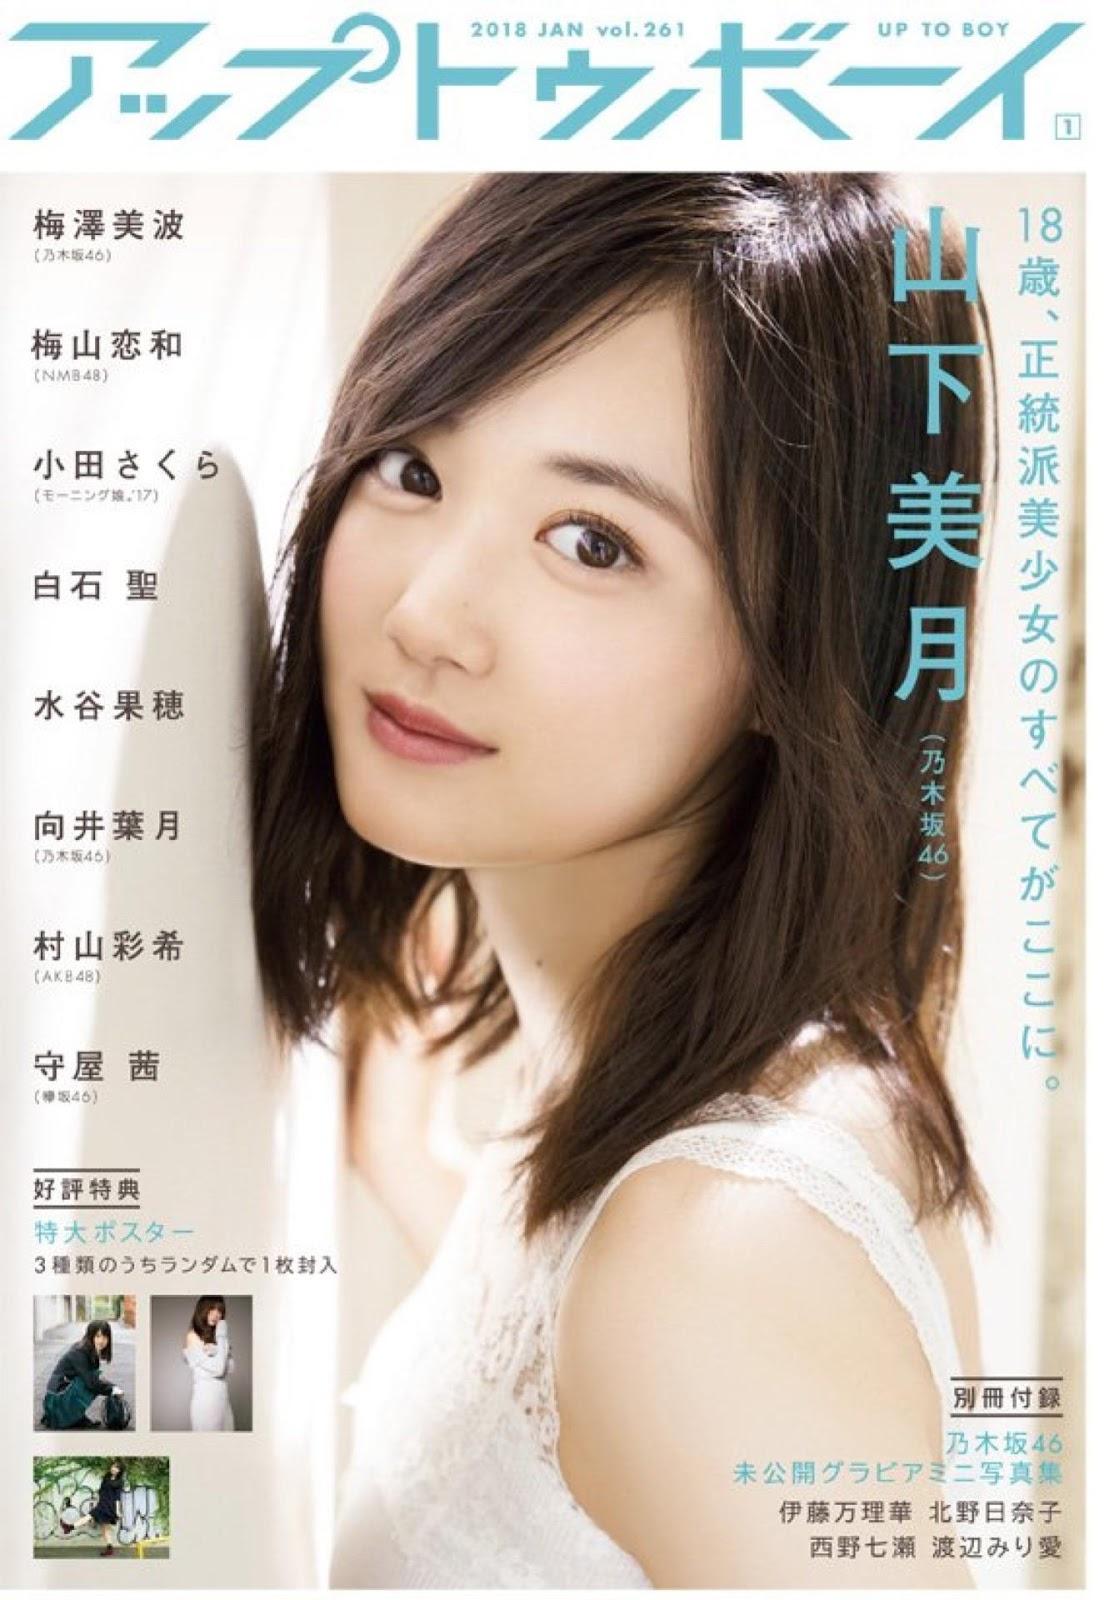 Yamashita Mizuki 山下美月, UTB 2018 No.01 vol.261 (アップトゥボーイ 2018年01月号)